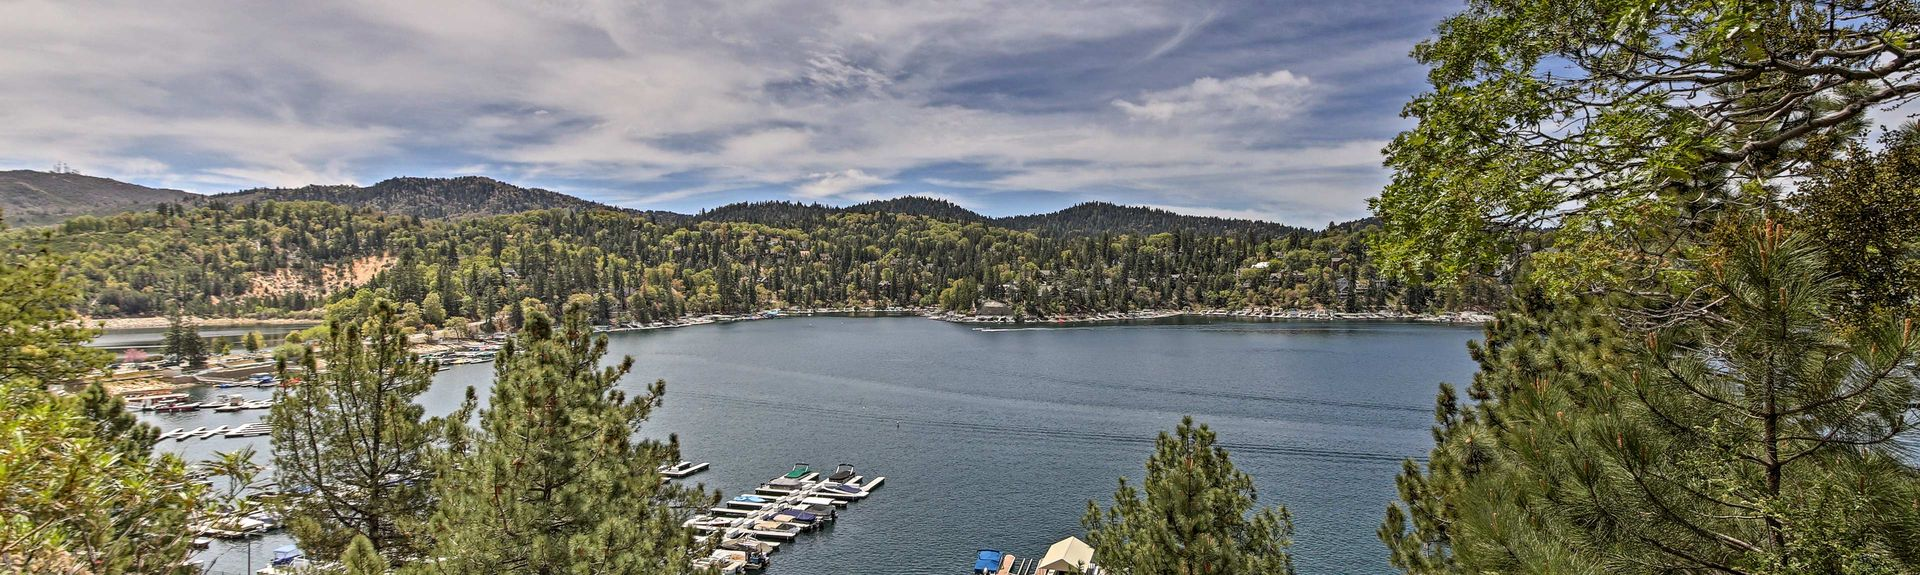 Lake Gregory Regional Park, Crestline, CA, USA